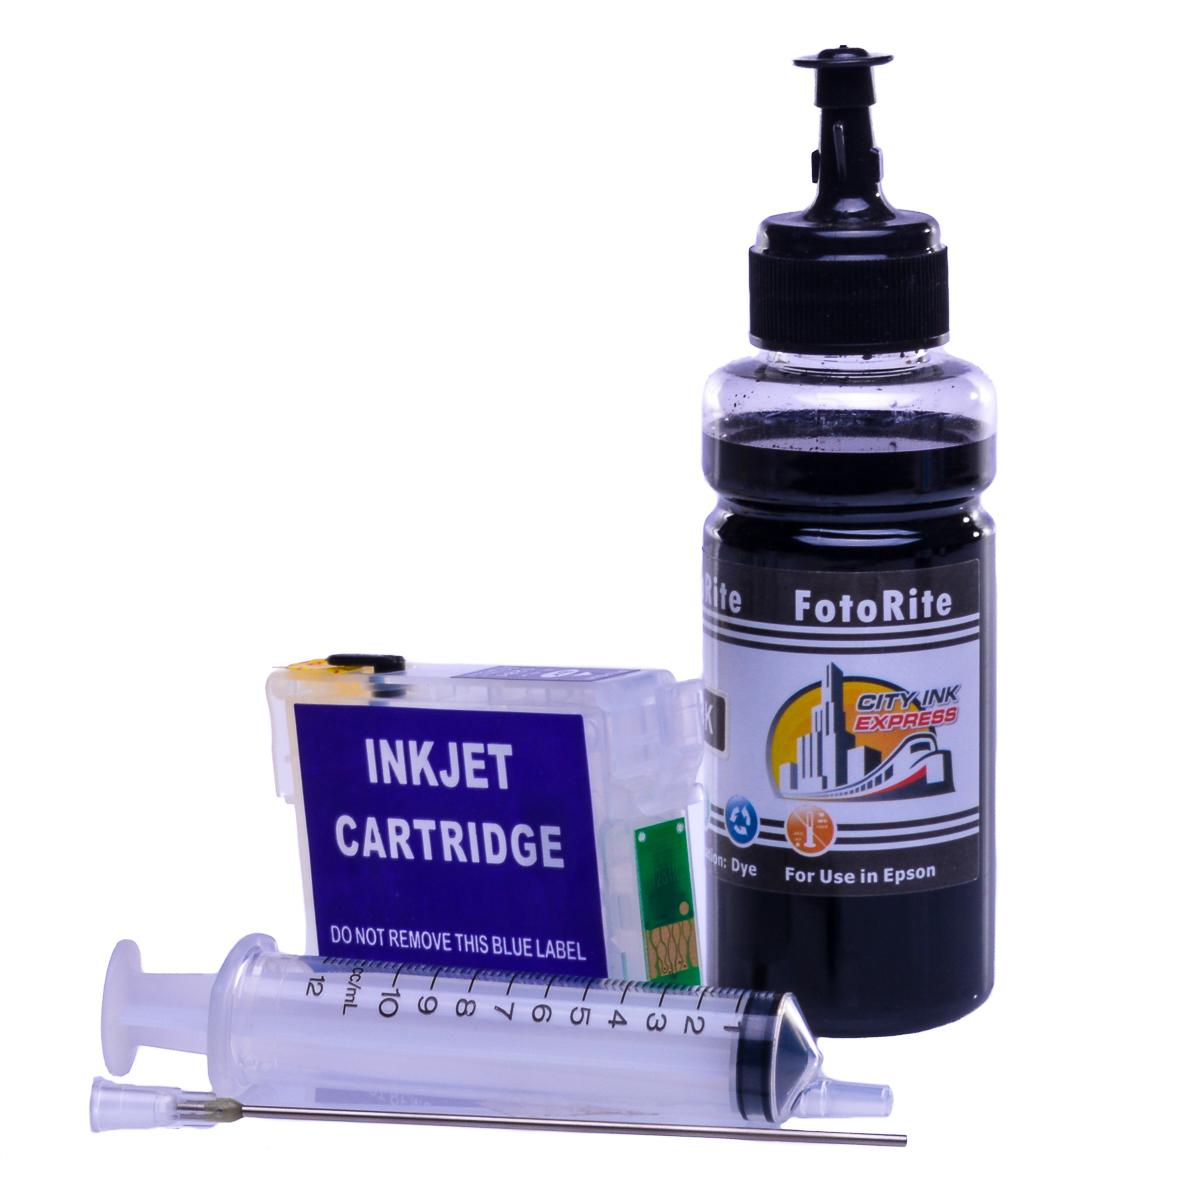 Refillable T0711 Black Cheap printer cartridges for Epson Stylus D78 C13T07114010 dye ink